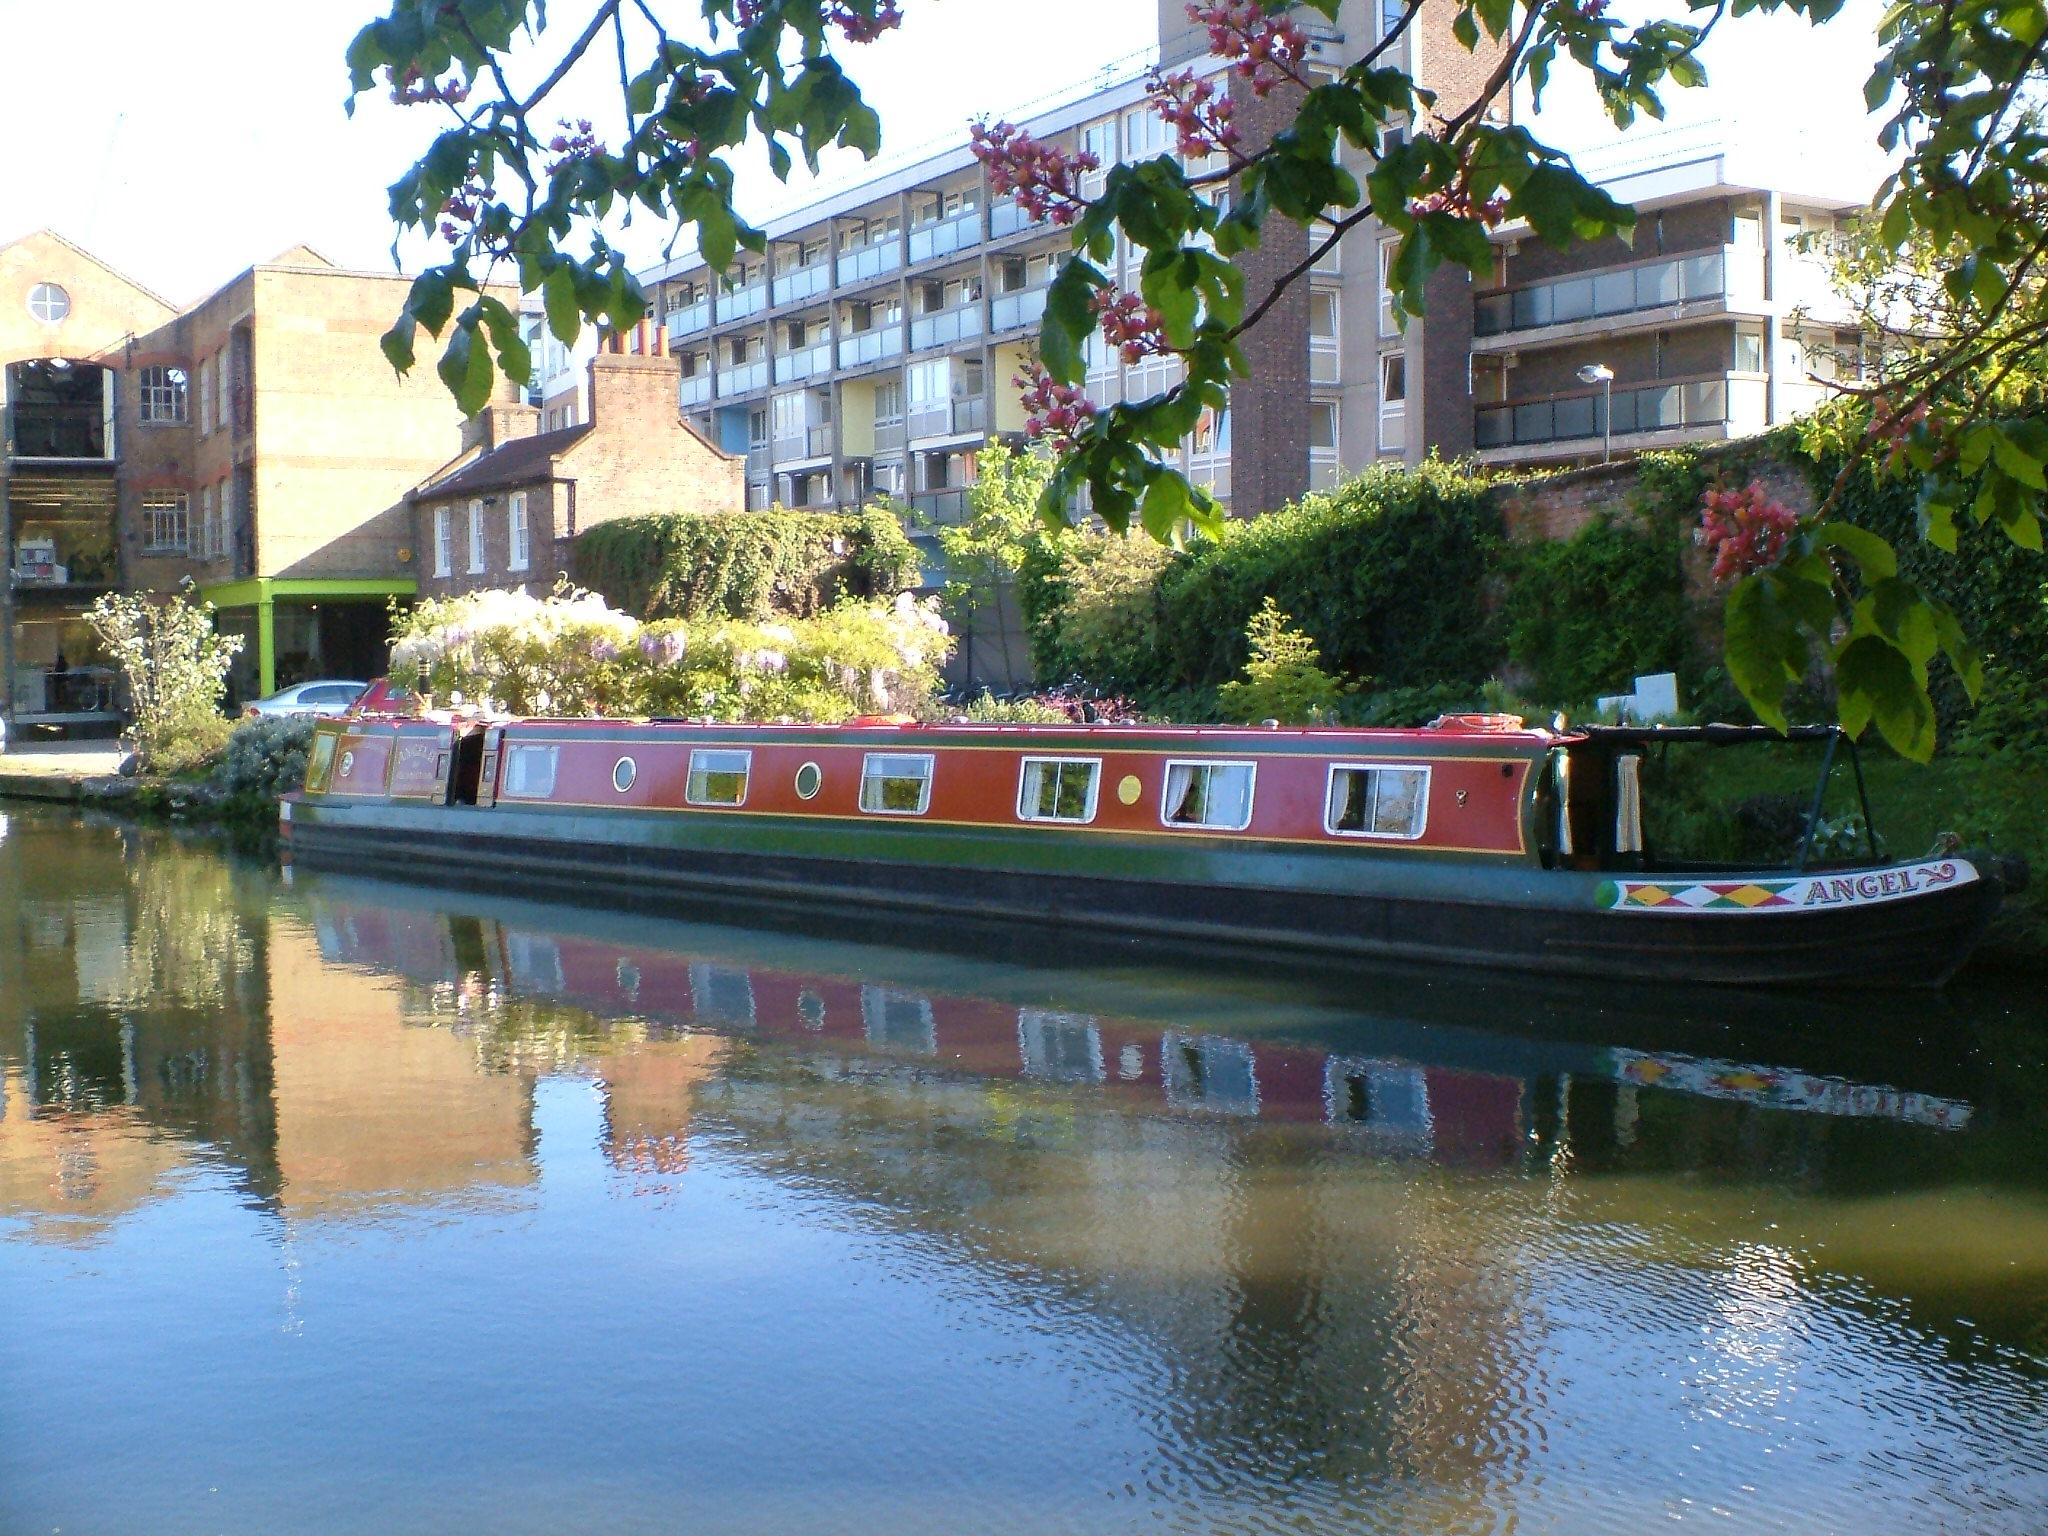 Image credit: Angel Community Canal Boat Trust